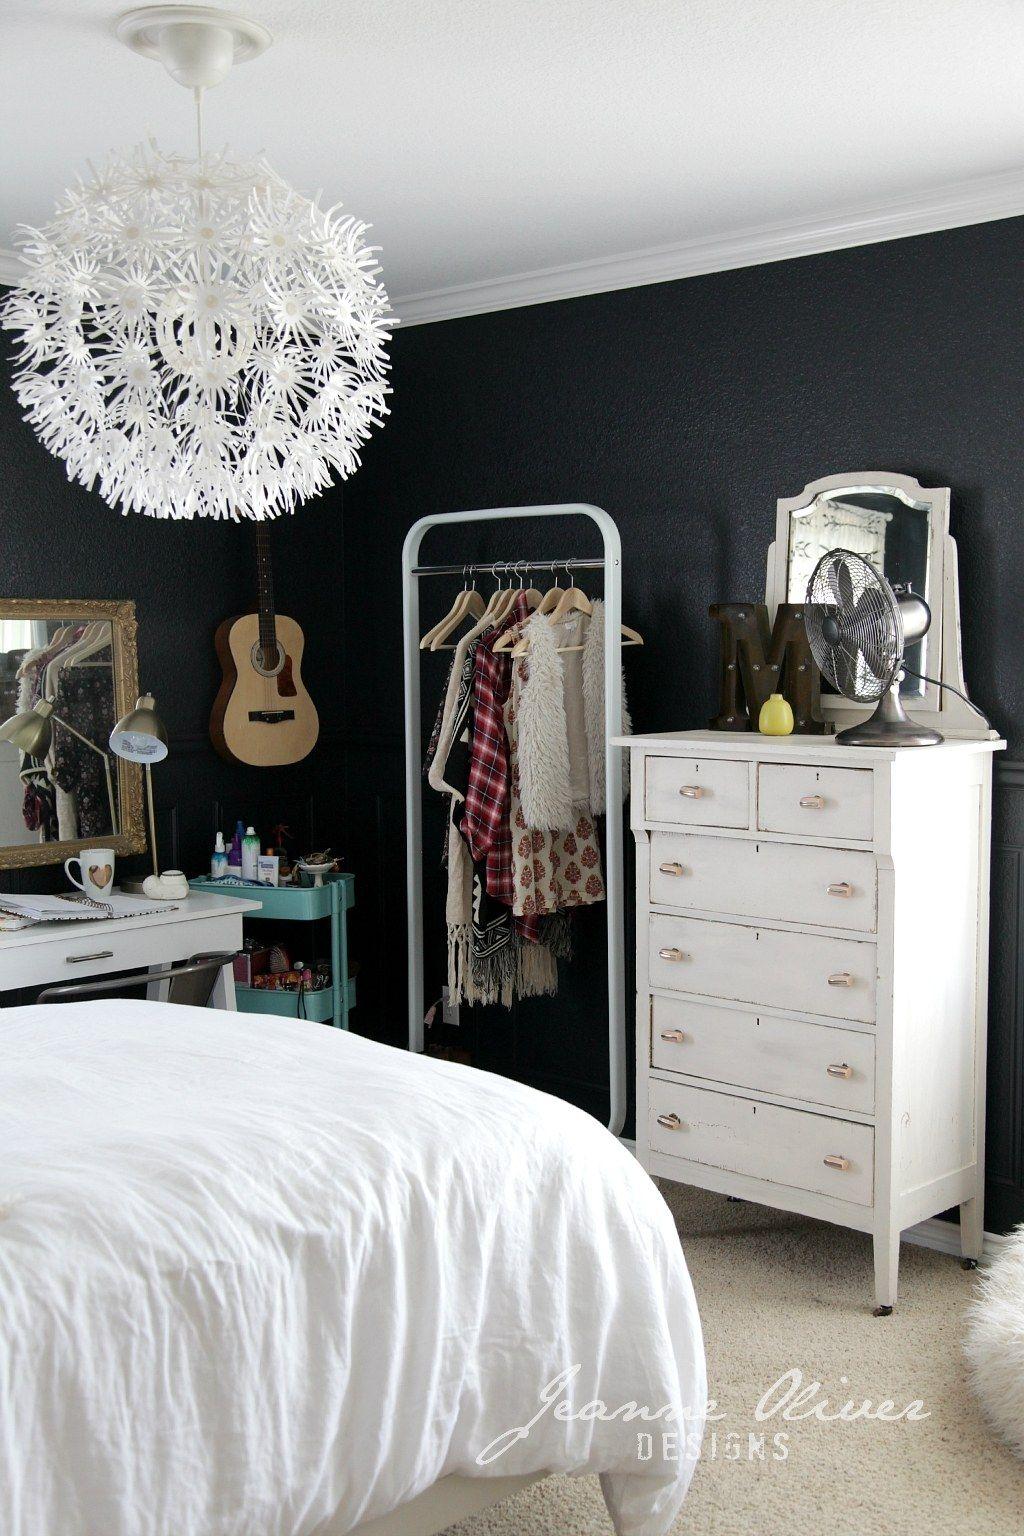 20 Sweet Tips for Your Teenage Girls Bedroom